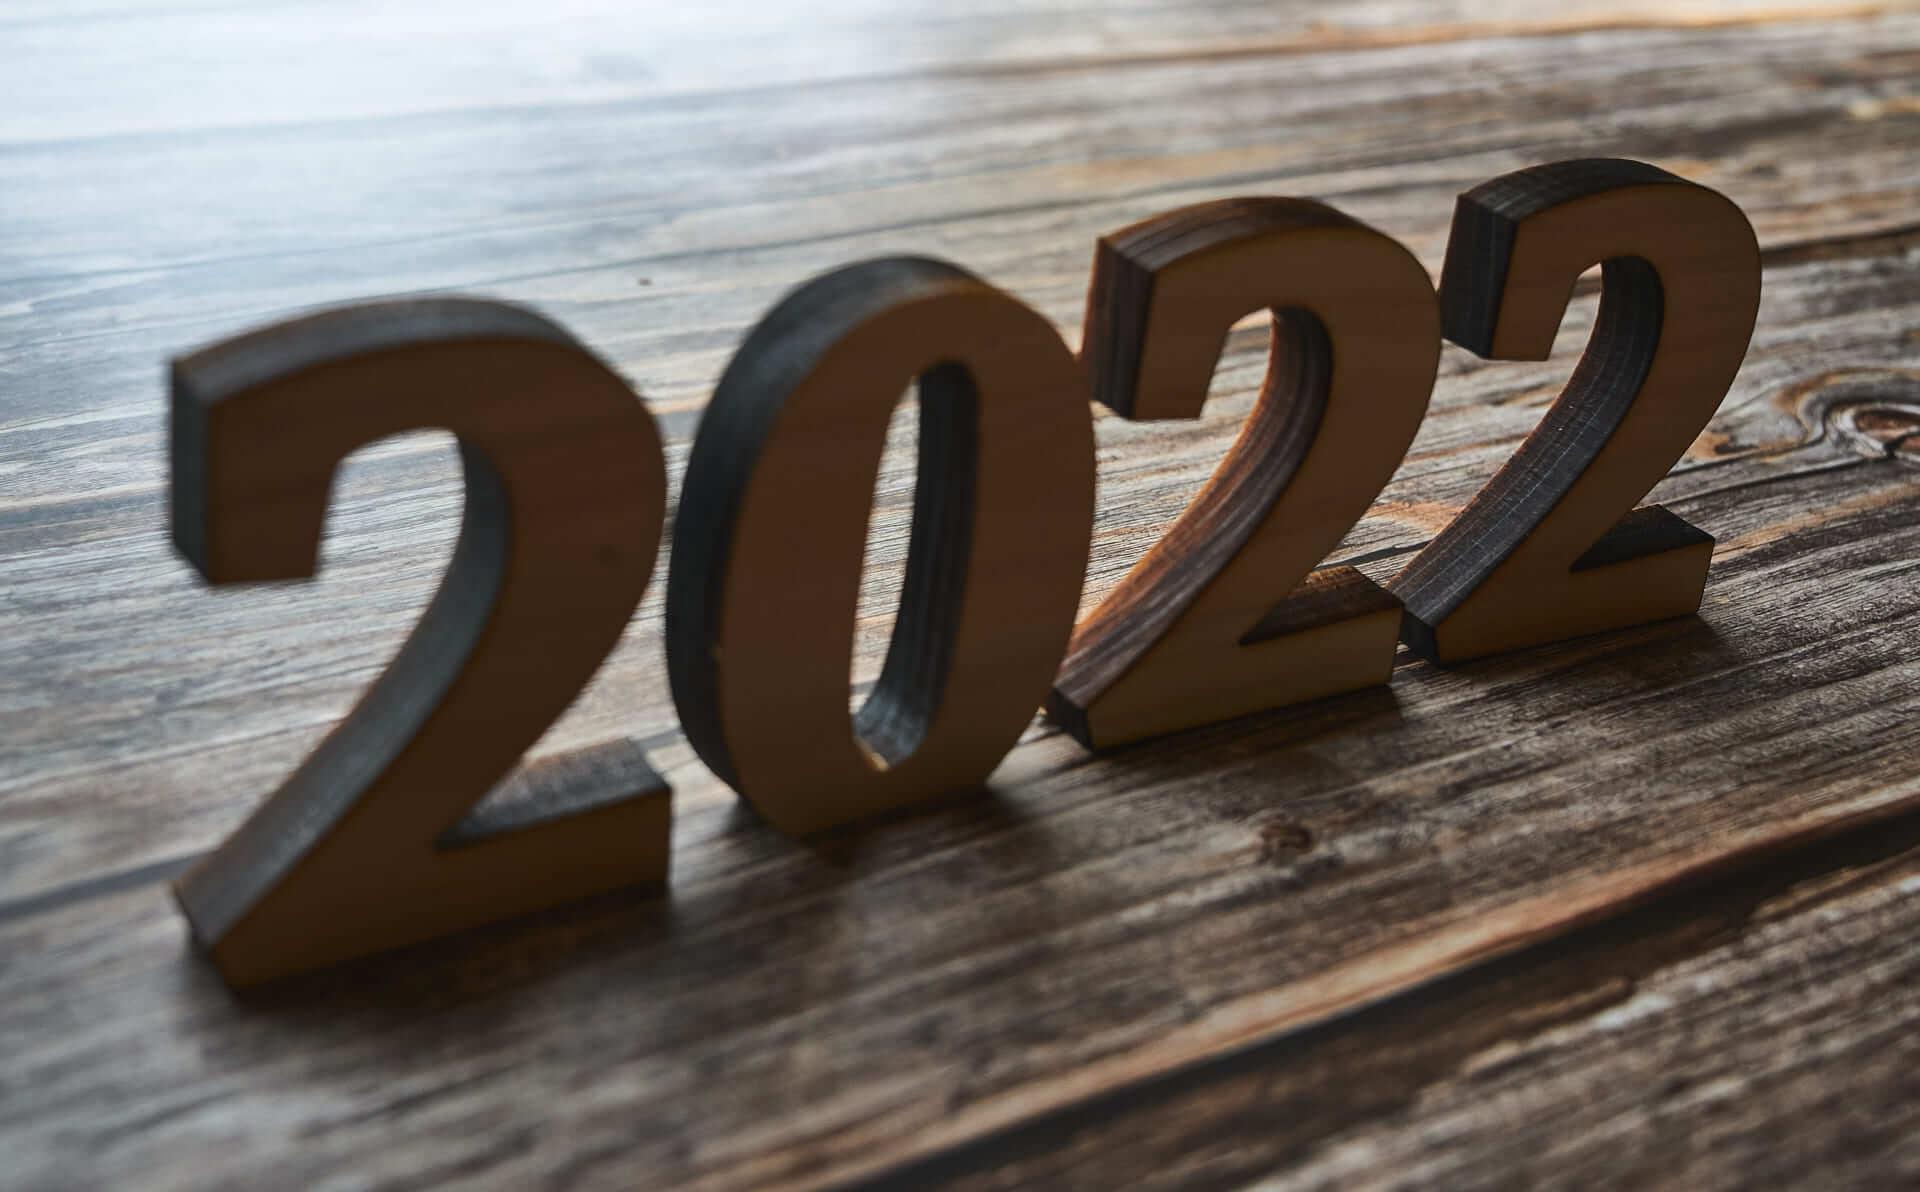 Love Me Doが占う2022年の恋愛運|1年後、2人はどうなる?